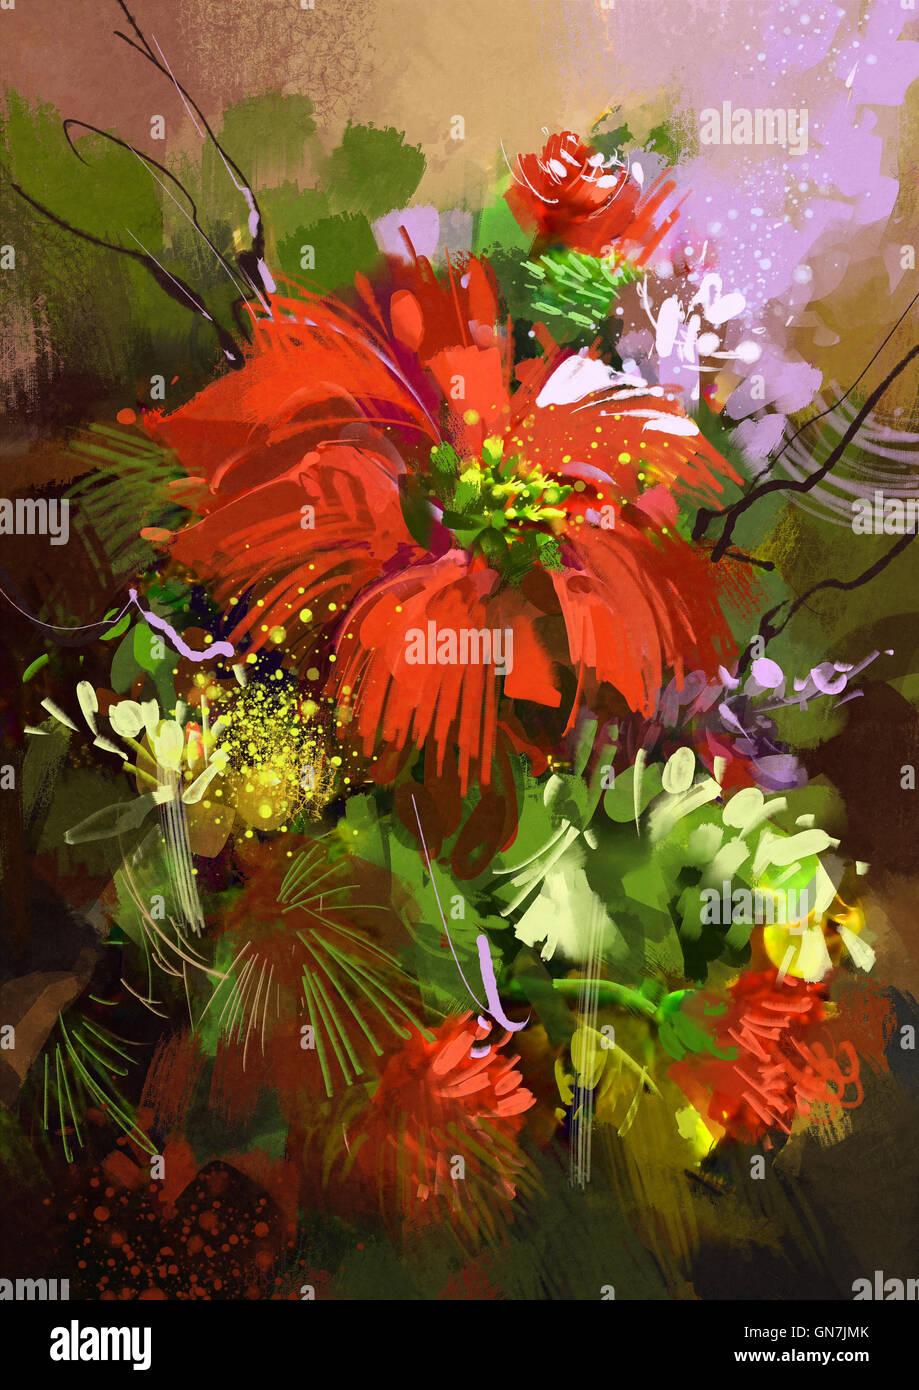 Oil Painting Beautiful Flowers Artwork Stock Photos & Oil Painting ...